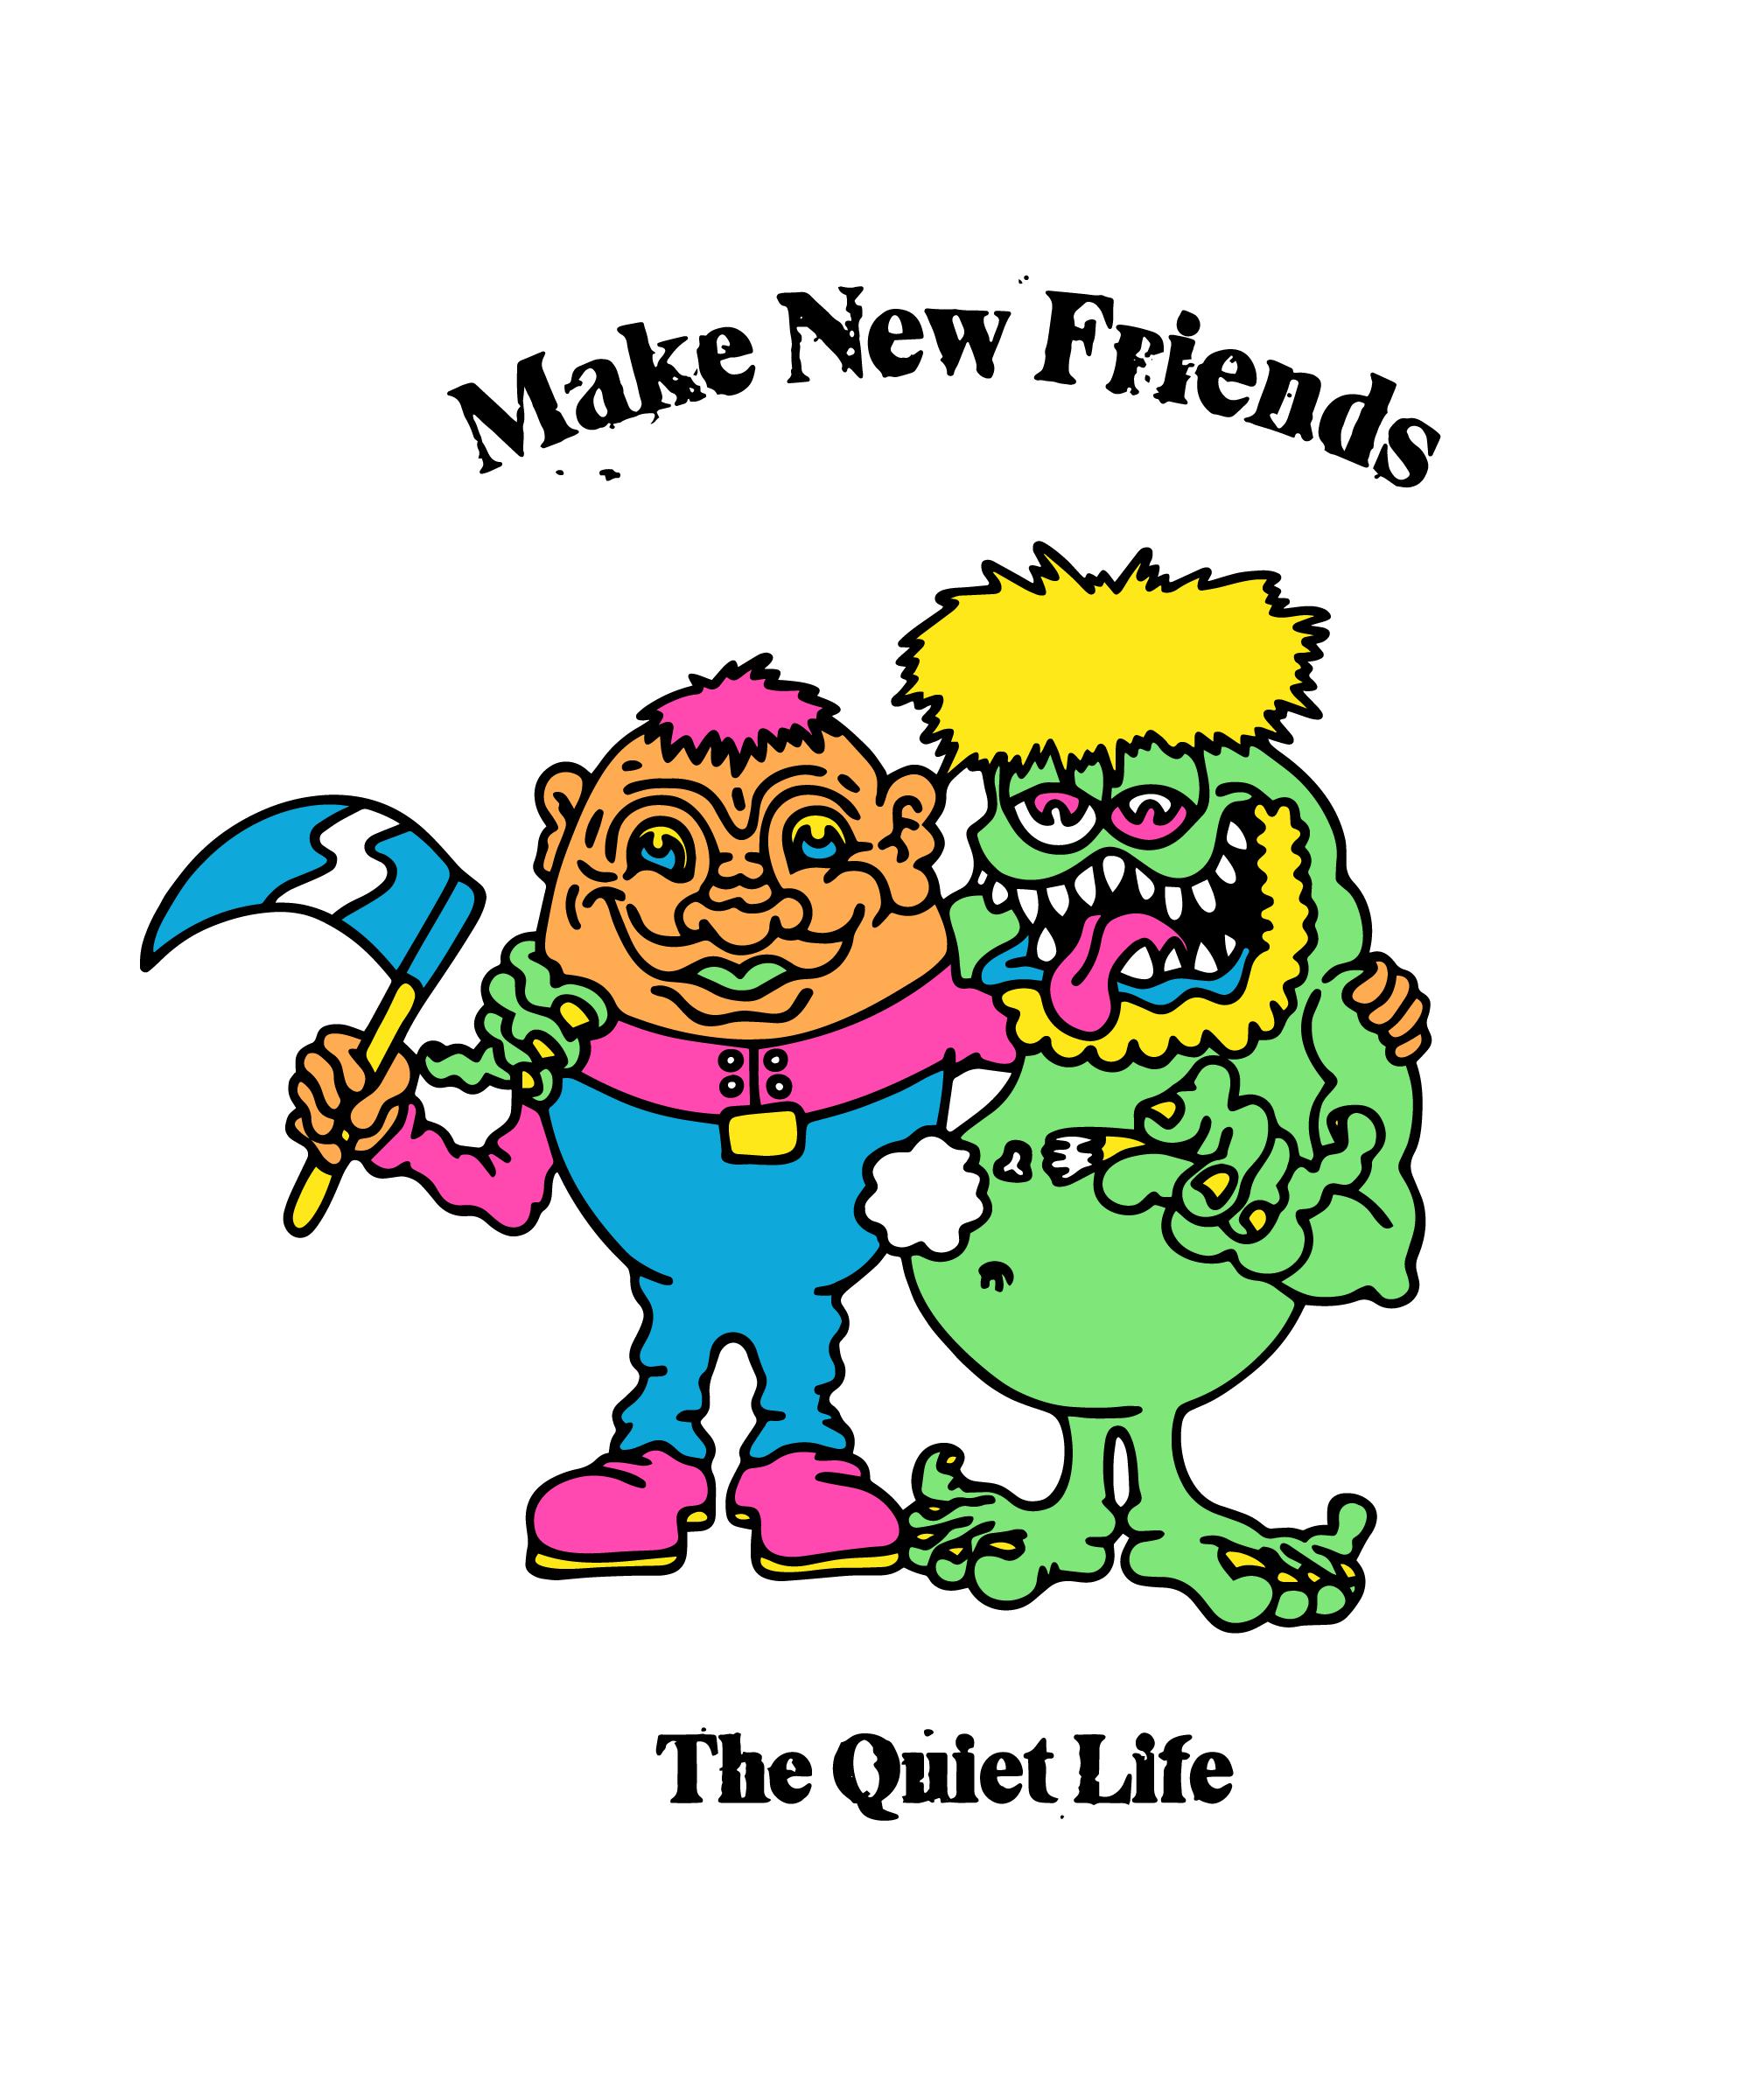 quiet-life-make-new-friends-2.png